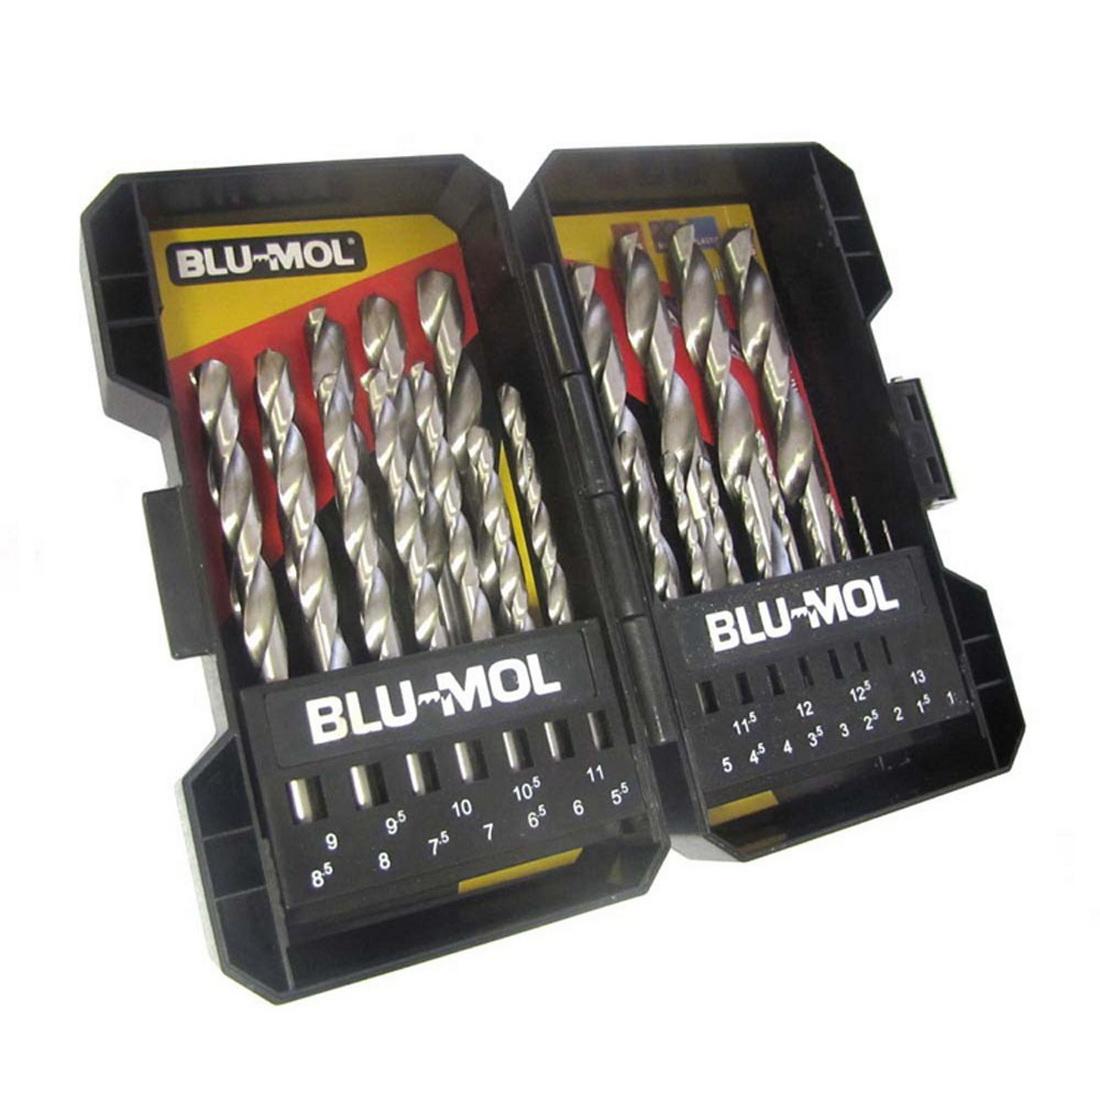 1-13mm 25-Piece Drill Bit Set